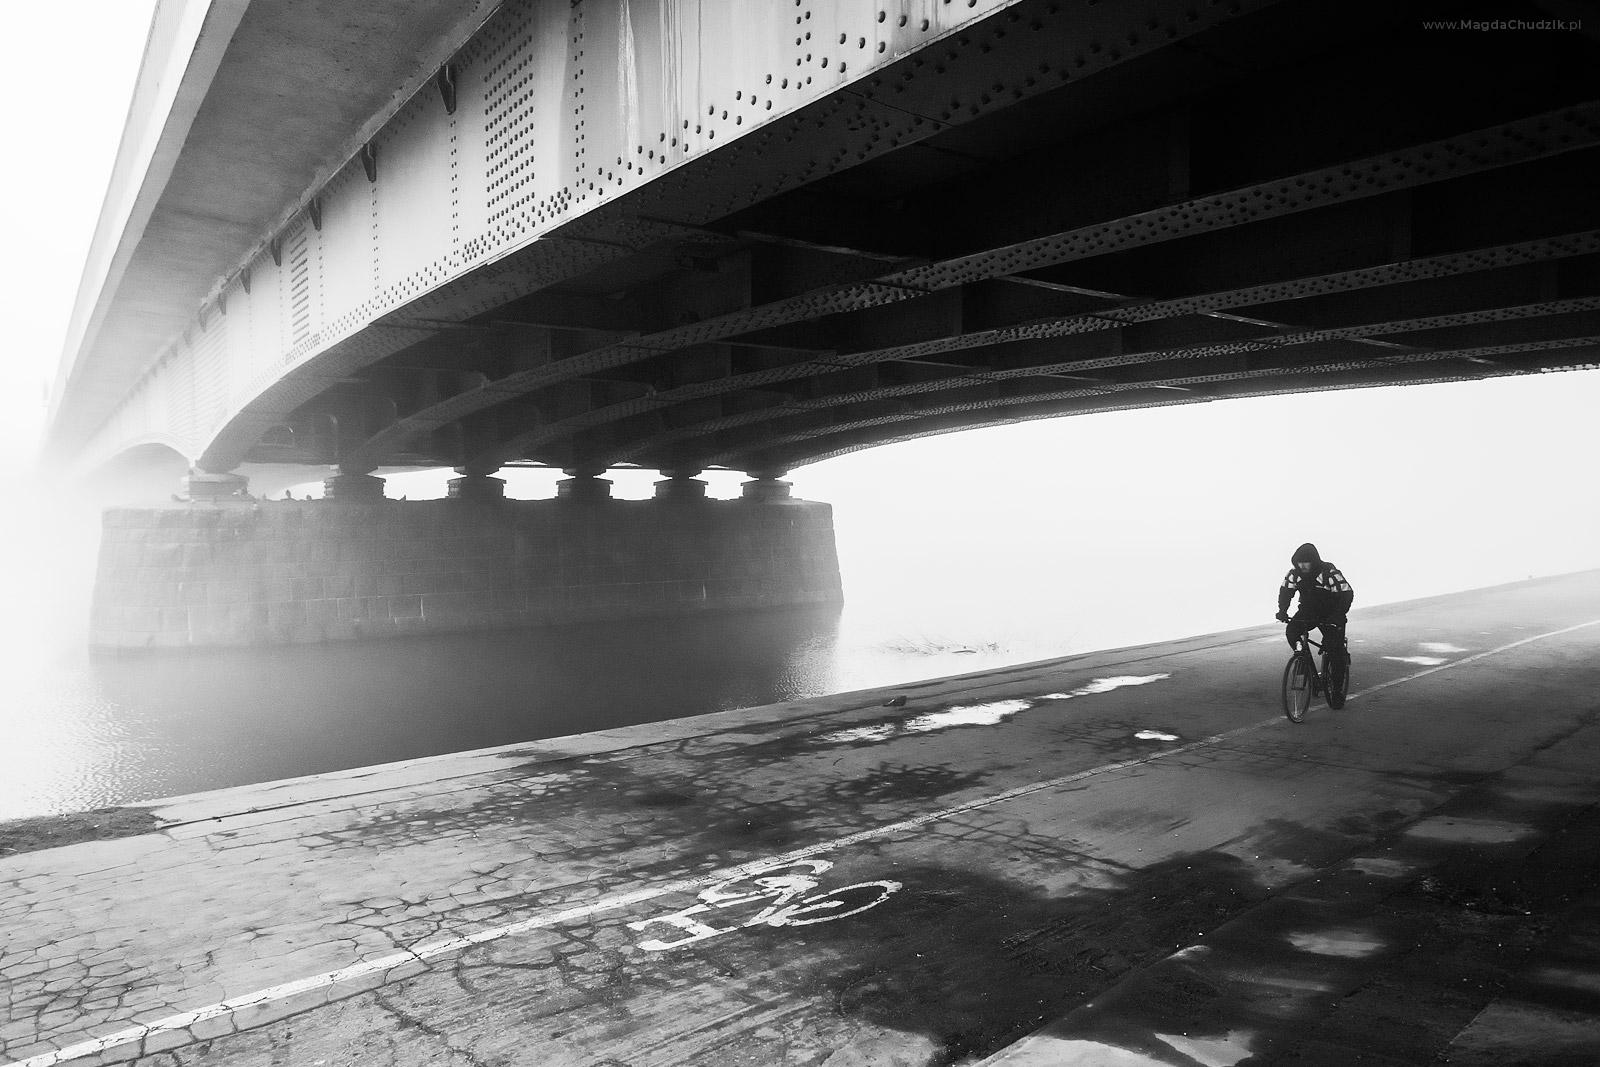 magda-chudzik-street-photography-poland-krakow-090